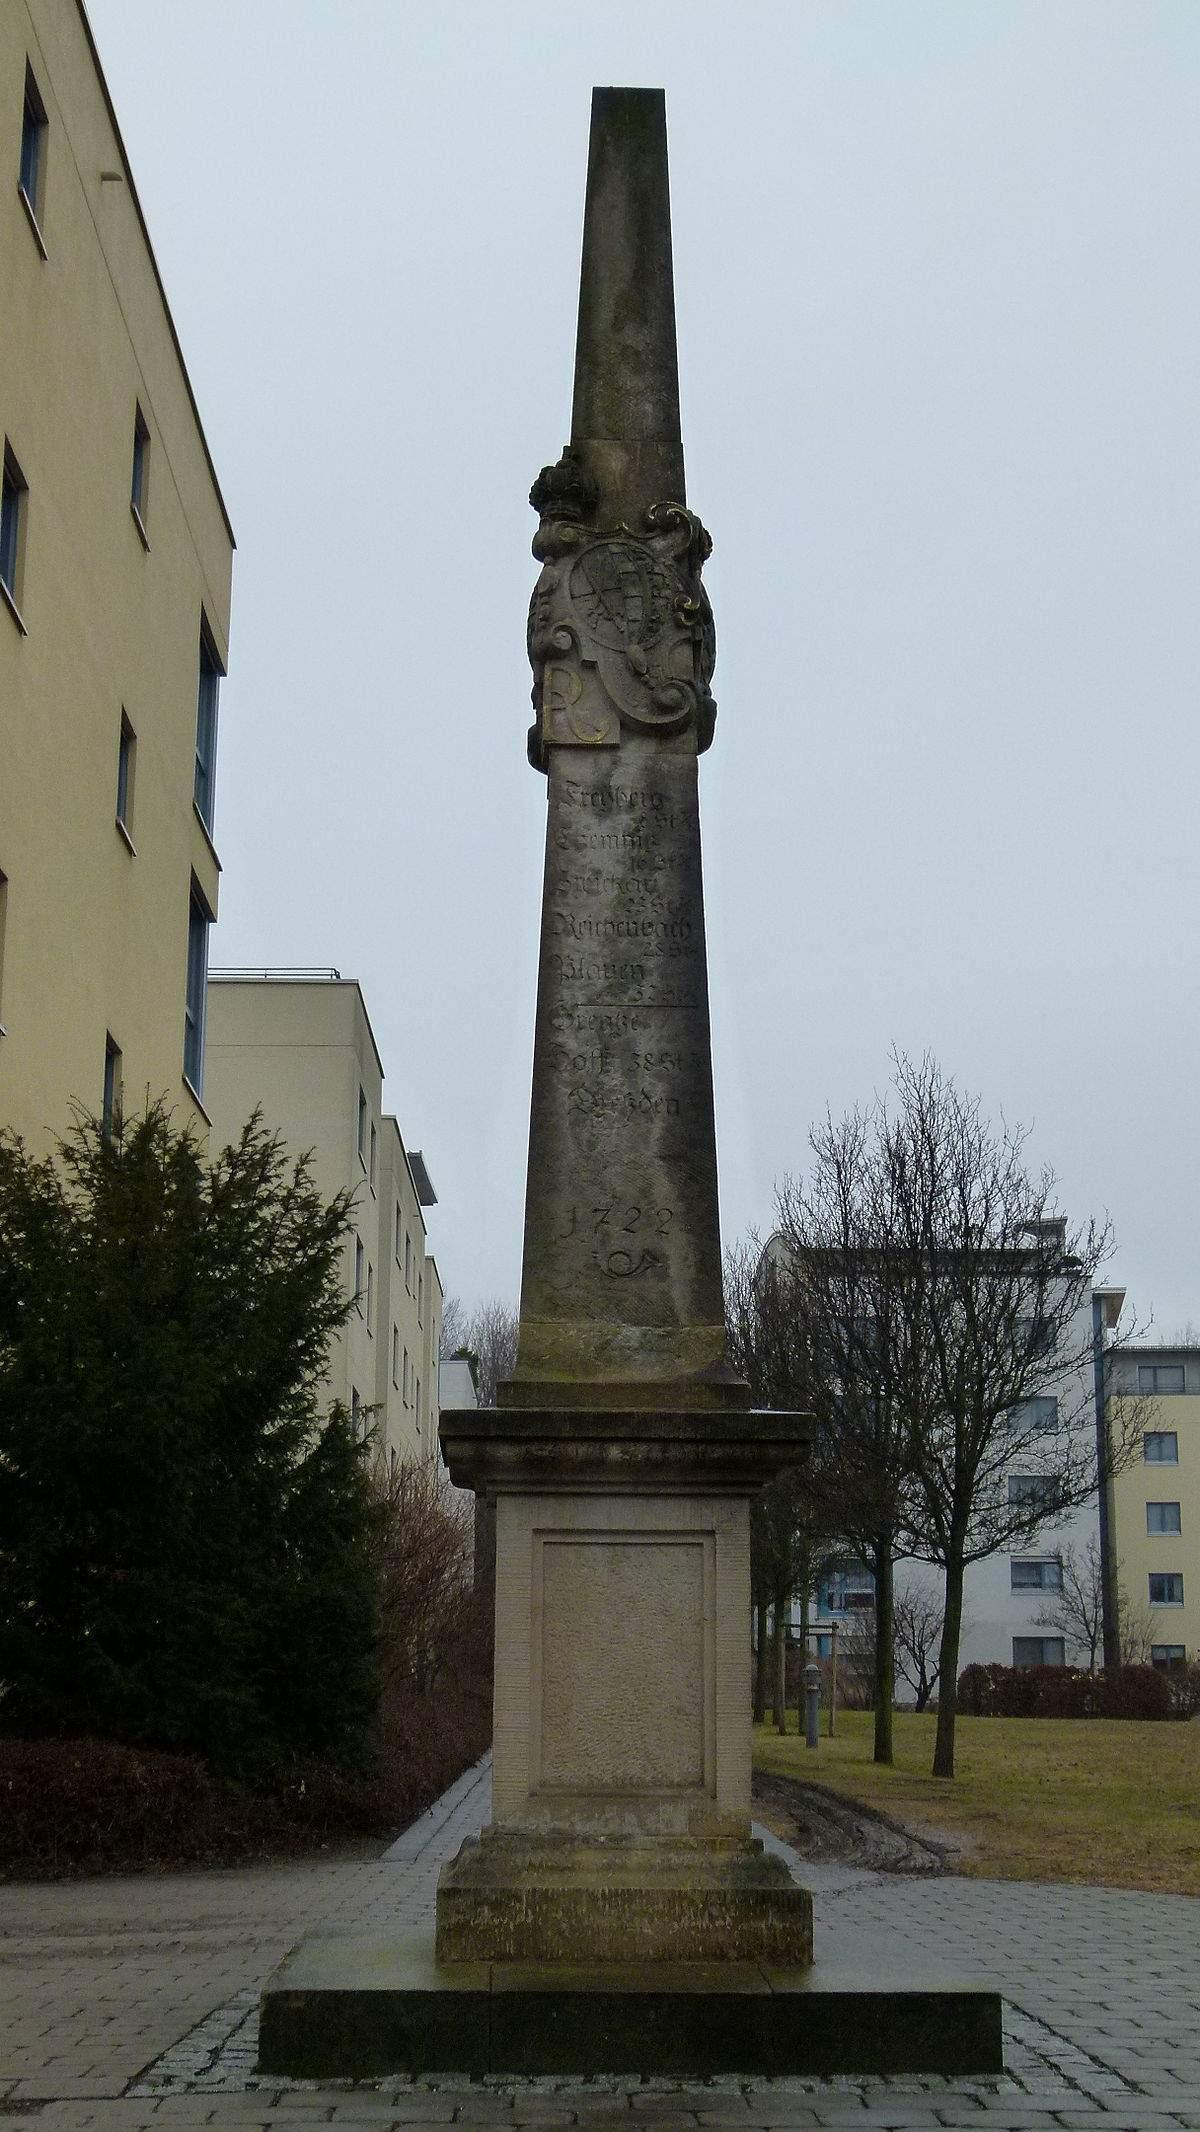 1200px Postmeilensäule Münzmeisterstraße 14b Dresden 4